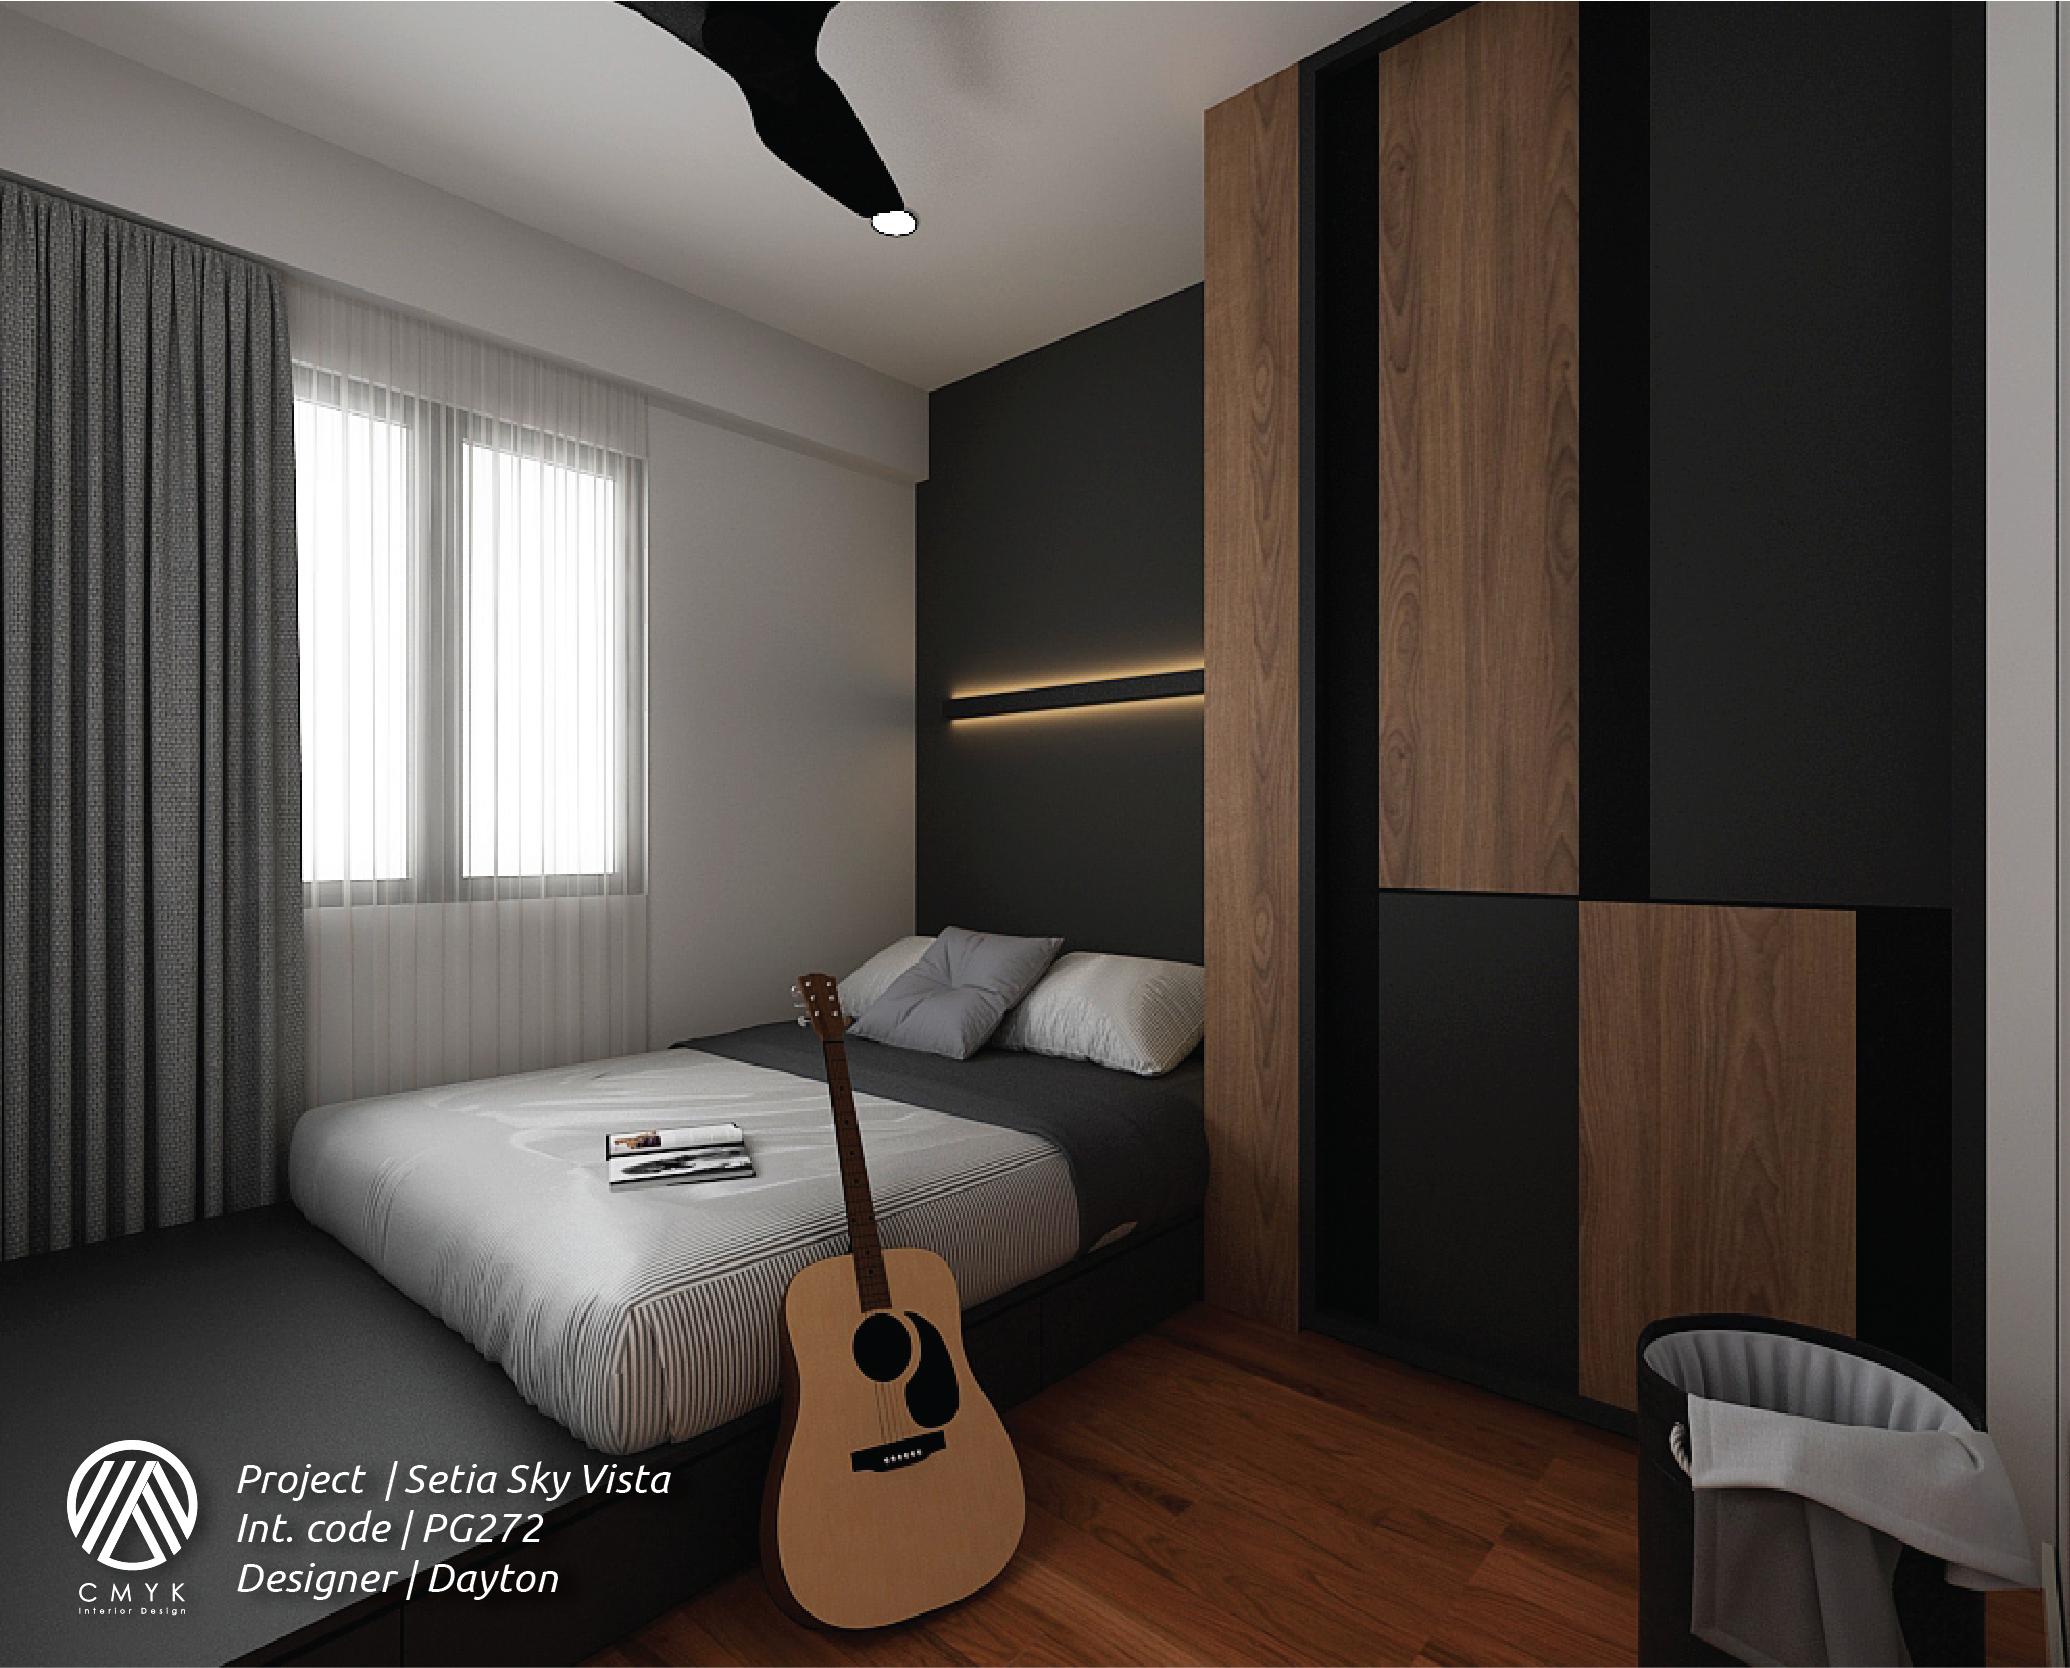 Residential   Penang   Setia Sky Vista-16120066503.jpg